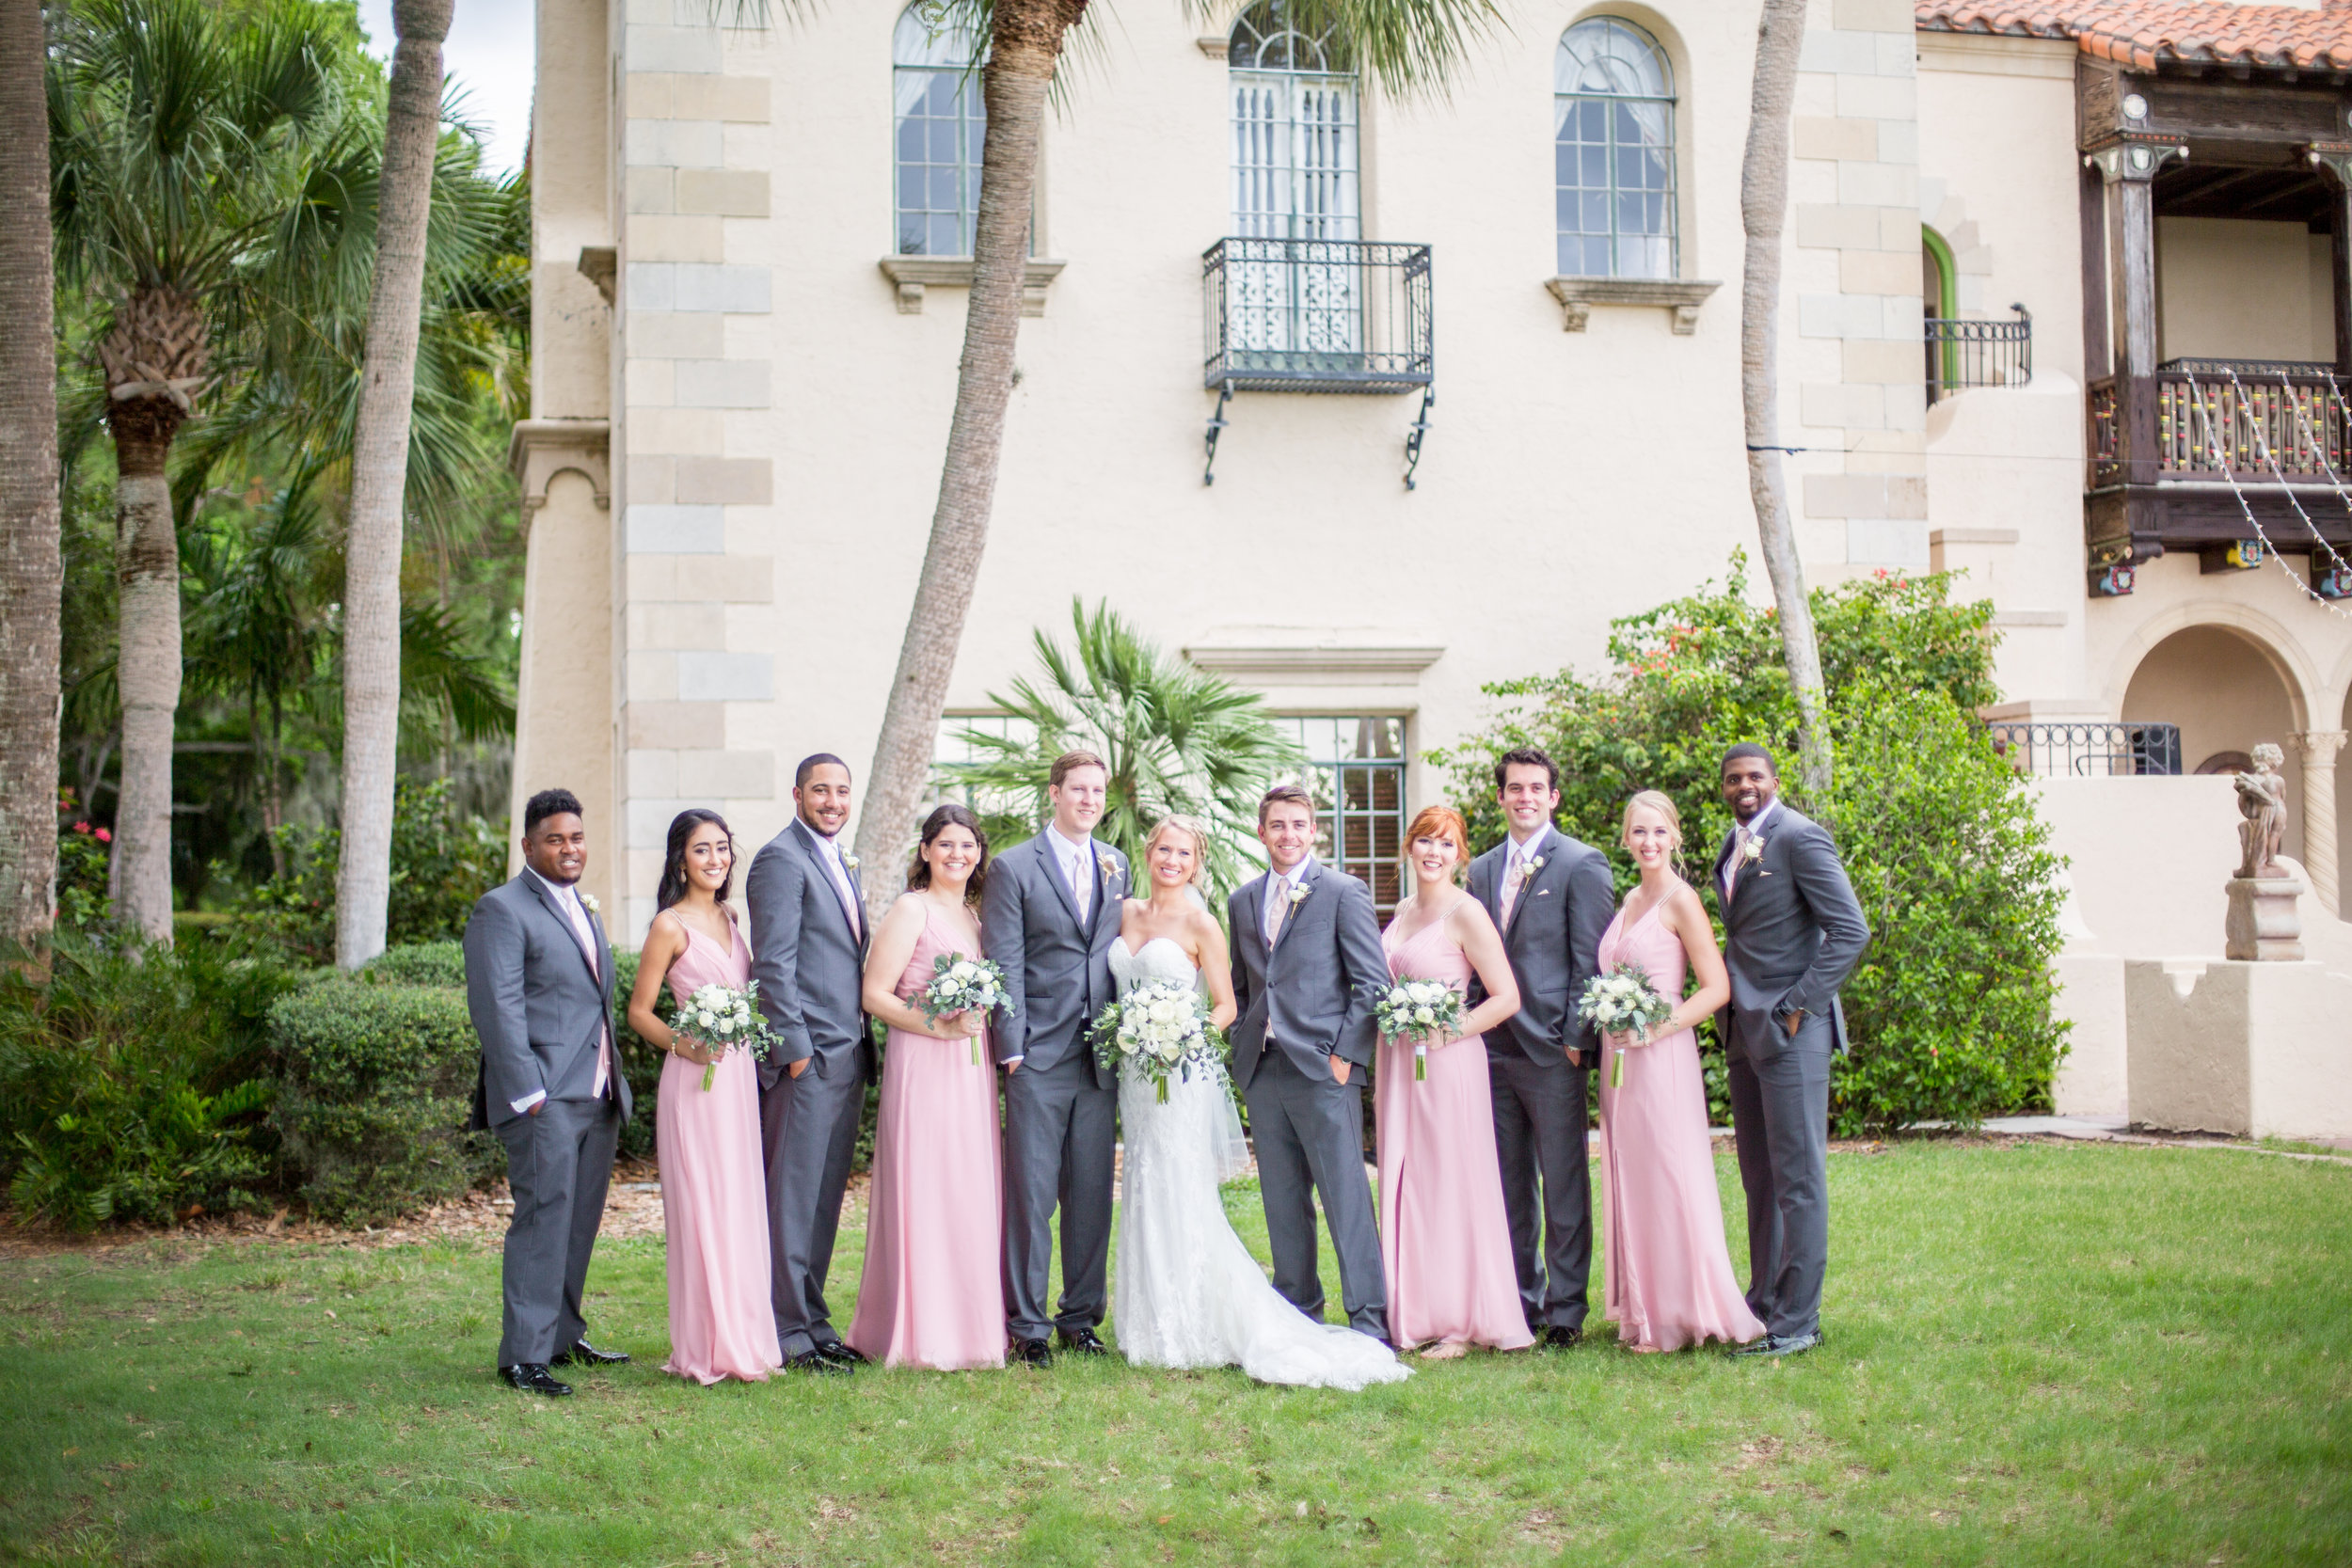 Powel Crosley Estate   Wedding   Pink and Gold Wedding   Wedding Portraits  Wedding Party   Sarasota Weddings   Spring Wedding   Jess Anne Photography